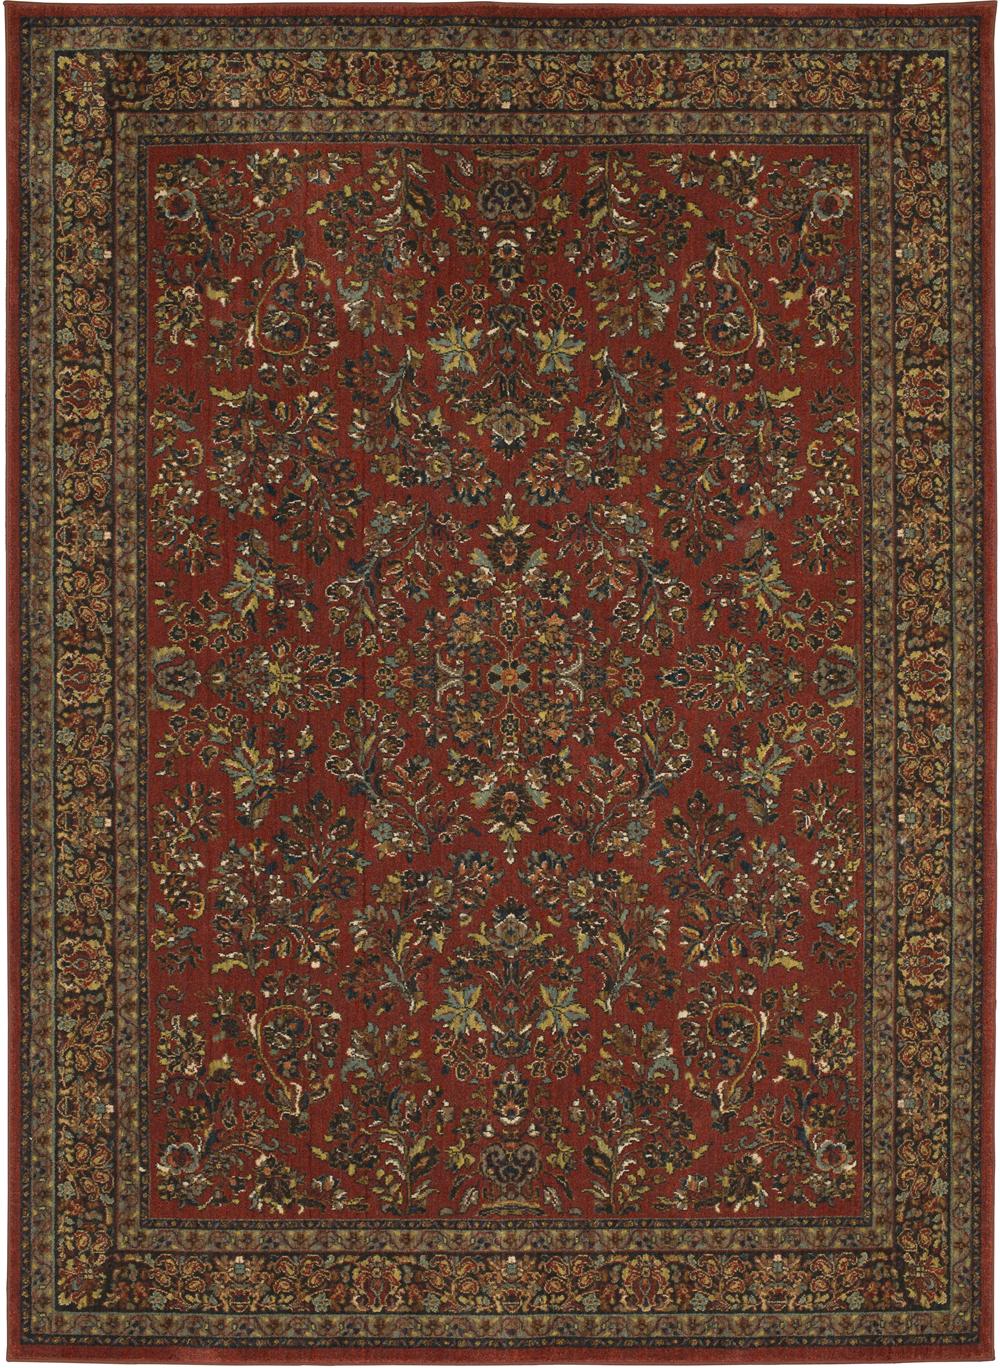 Karastan Spice Market 91648 Berdan Garnet Rug